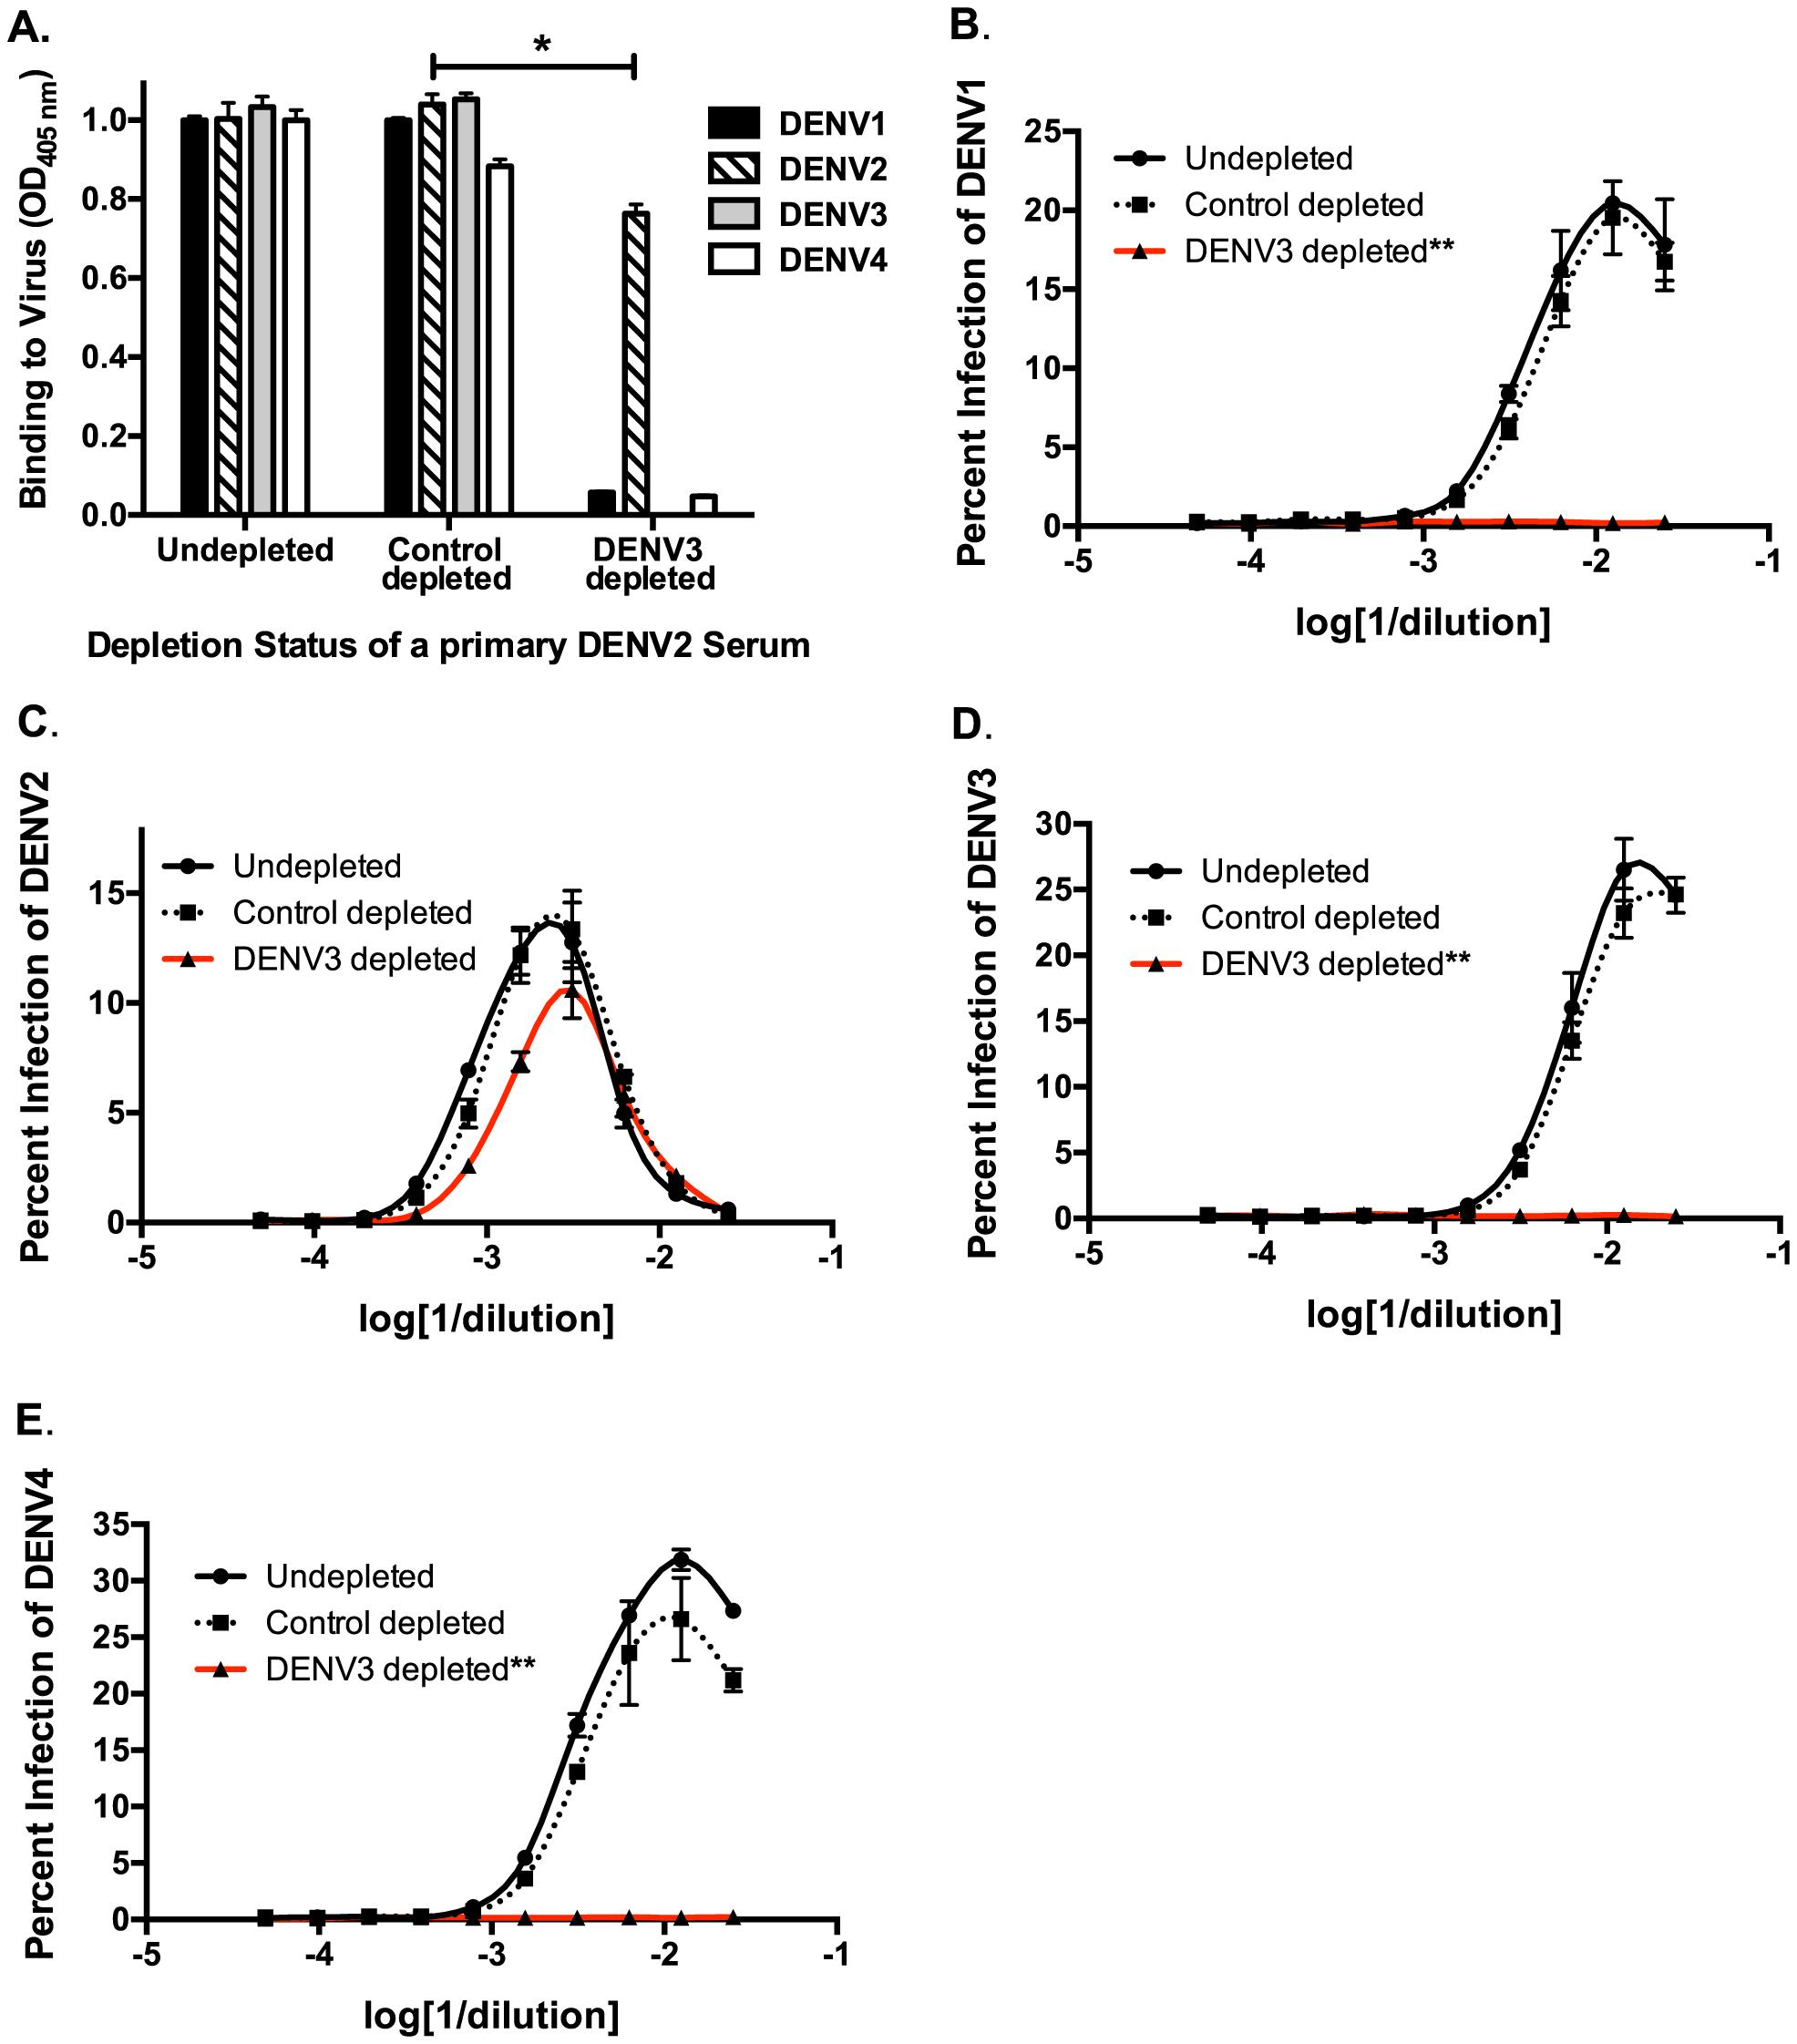 Removal of cross-reactive antibodies from primary DENV2-immune sera, eliminates enhancement of heterotypic DENV infection <i>in vitro</i>.